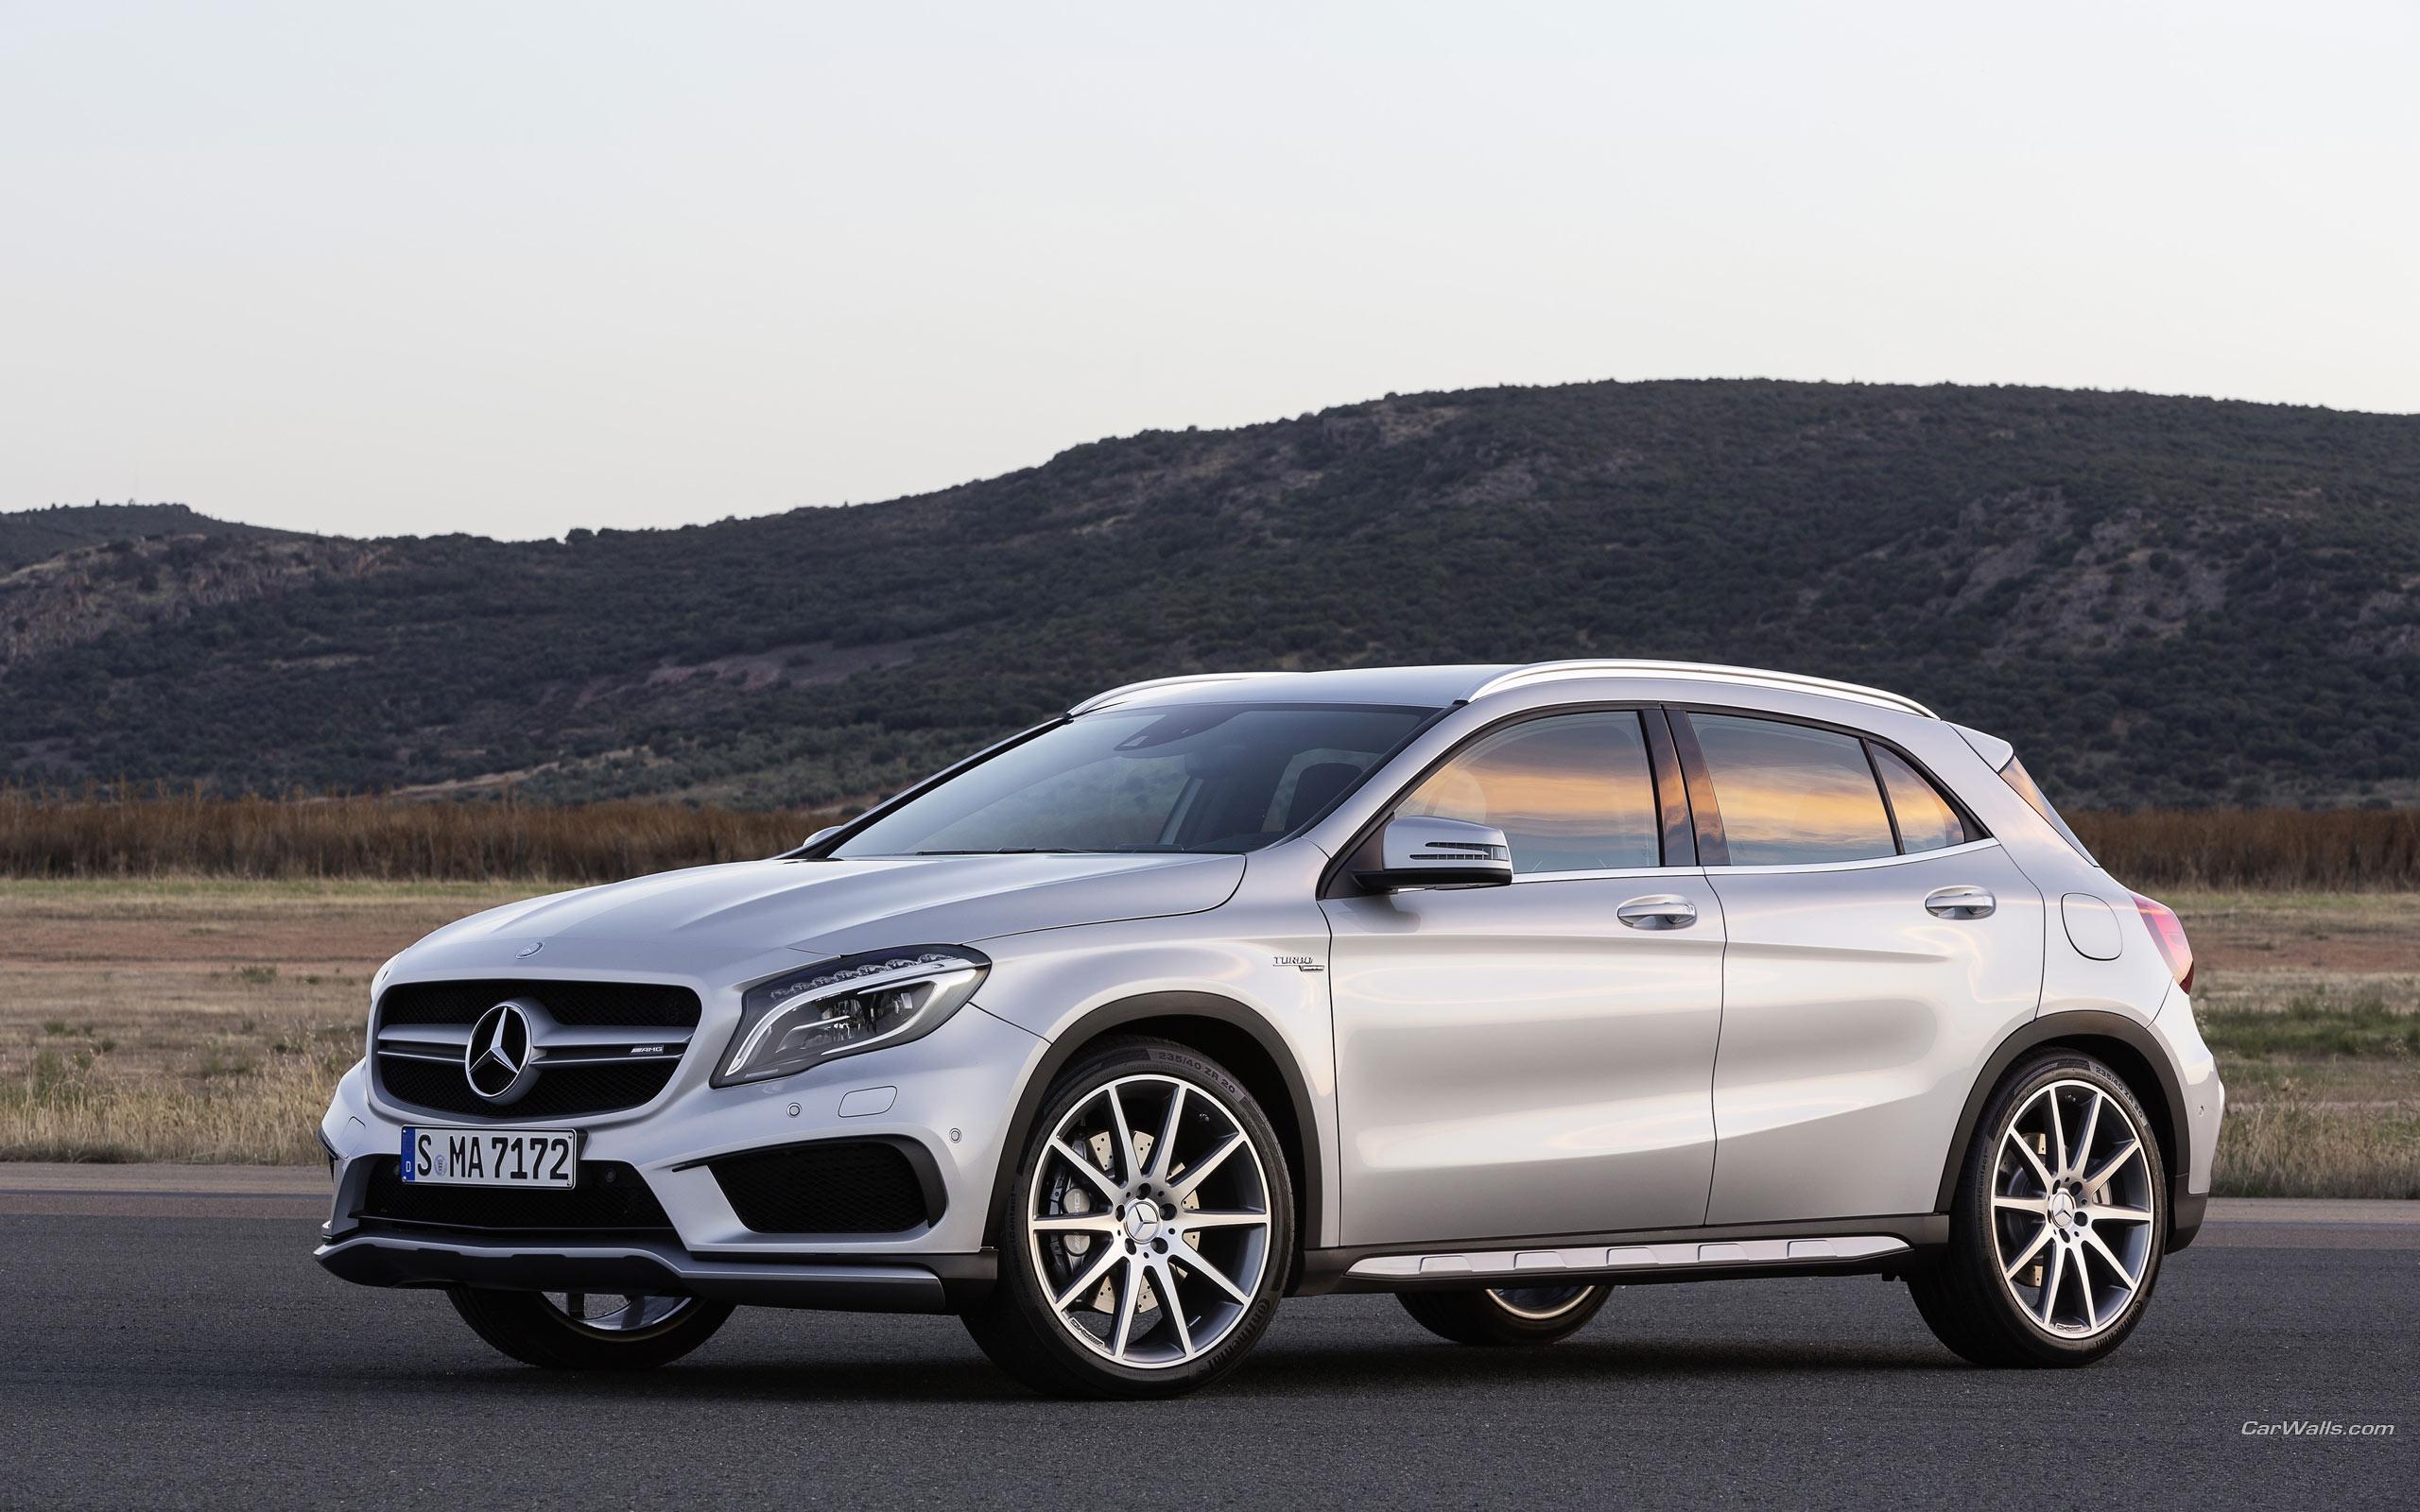 2015 Mercedes Benz GLA45 AMG Wallpaper WallpaperListsCOM 2560x1600